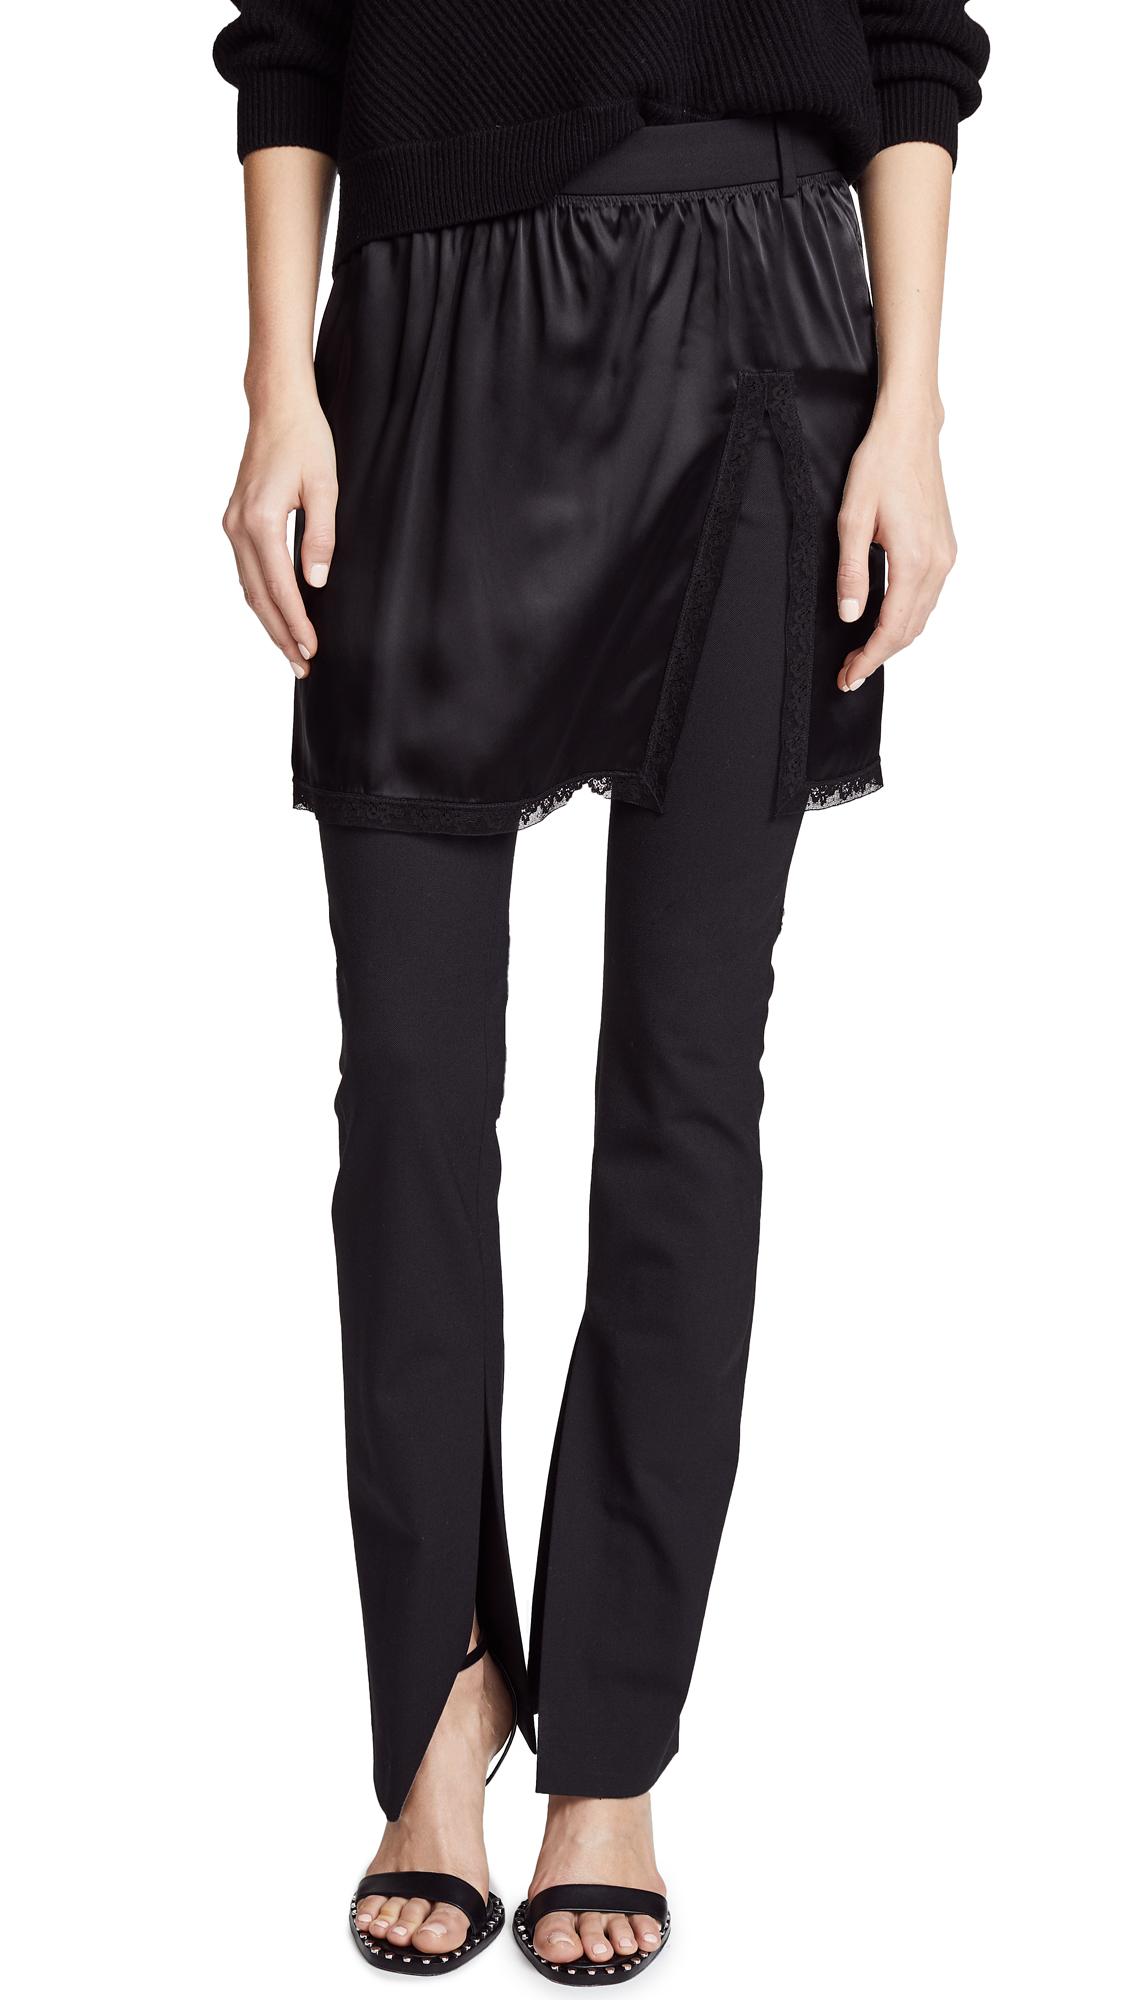 Alexander Wang Hybrid Pants with Lace Border